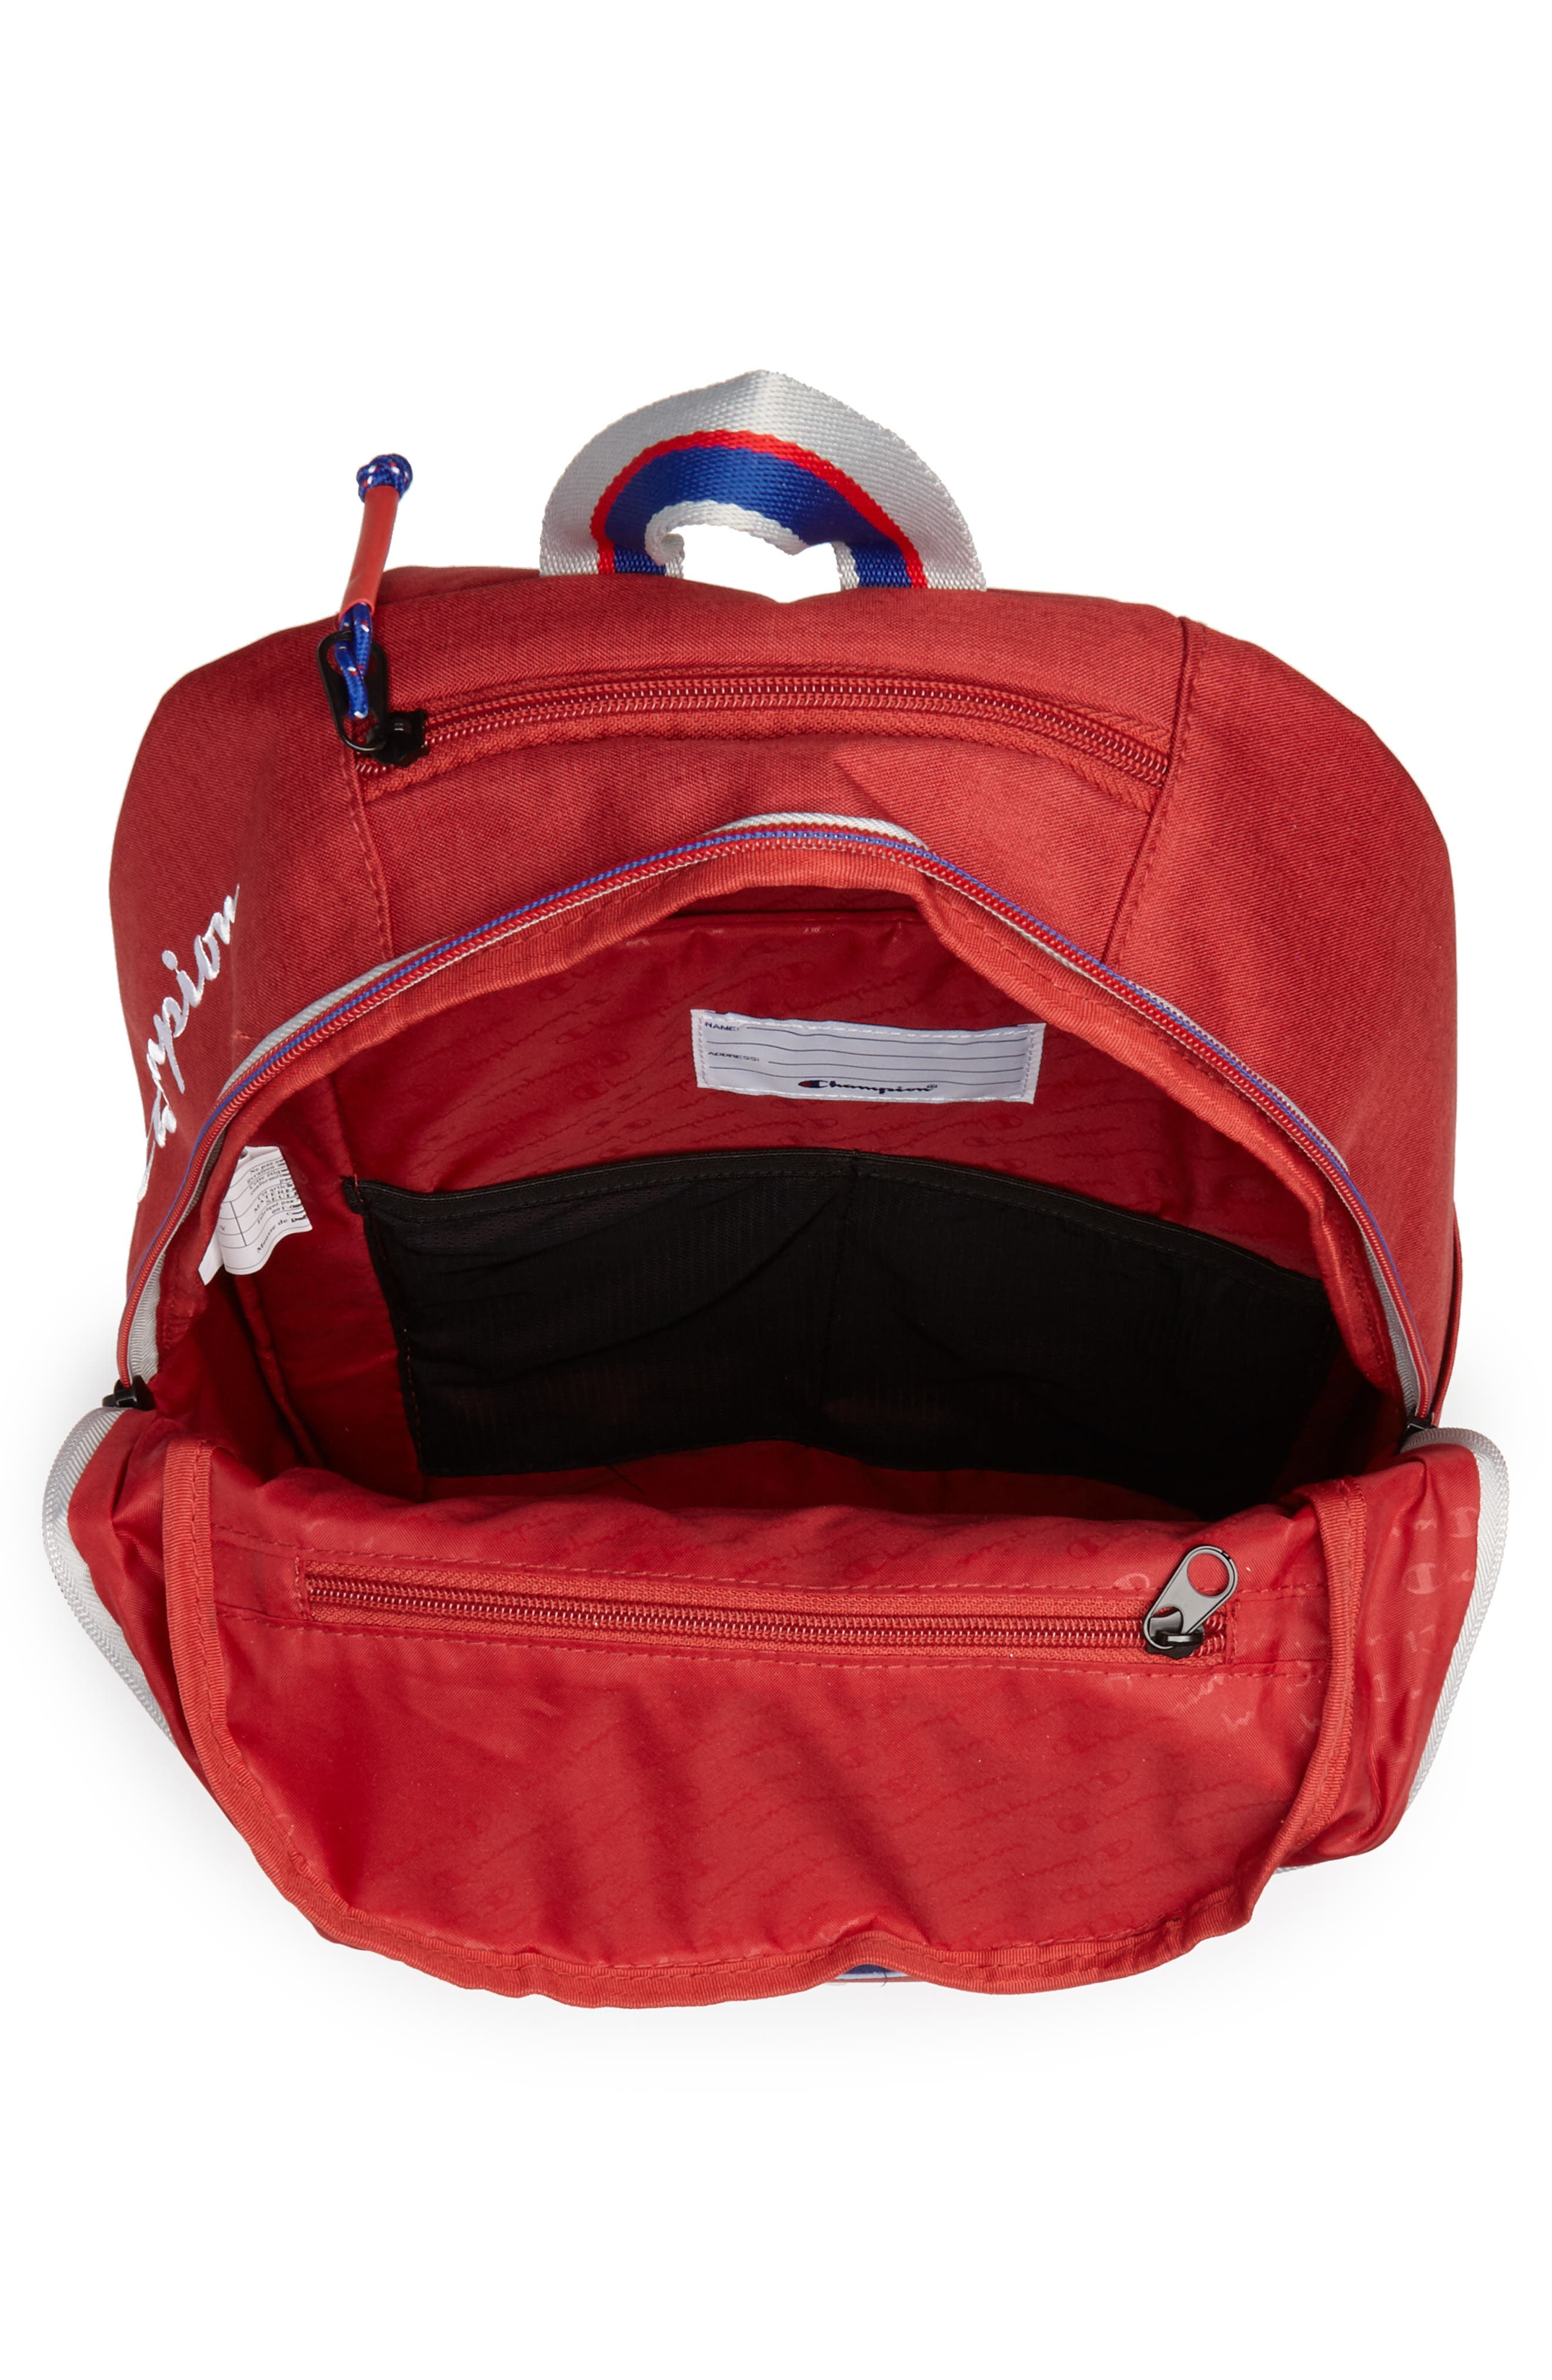 Supercize Backpack,                             Alternate thumbnail 4, color,                             SCARLET HEATHER